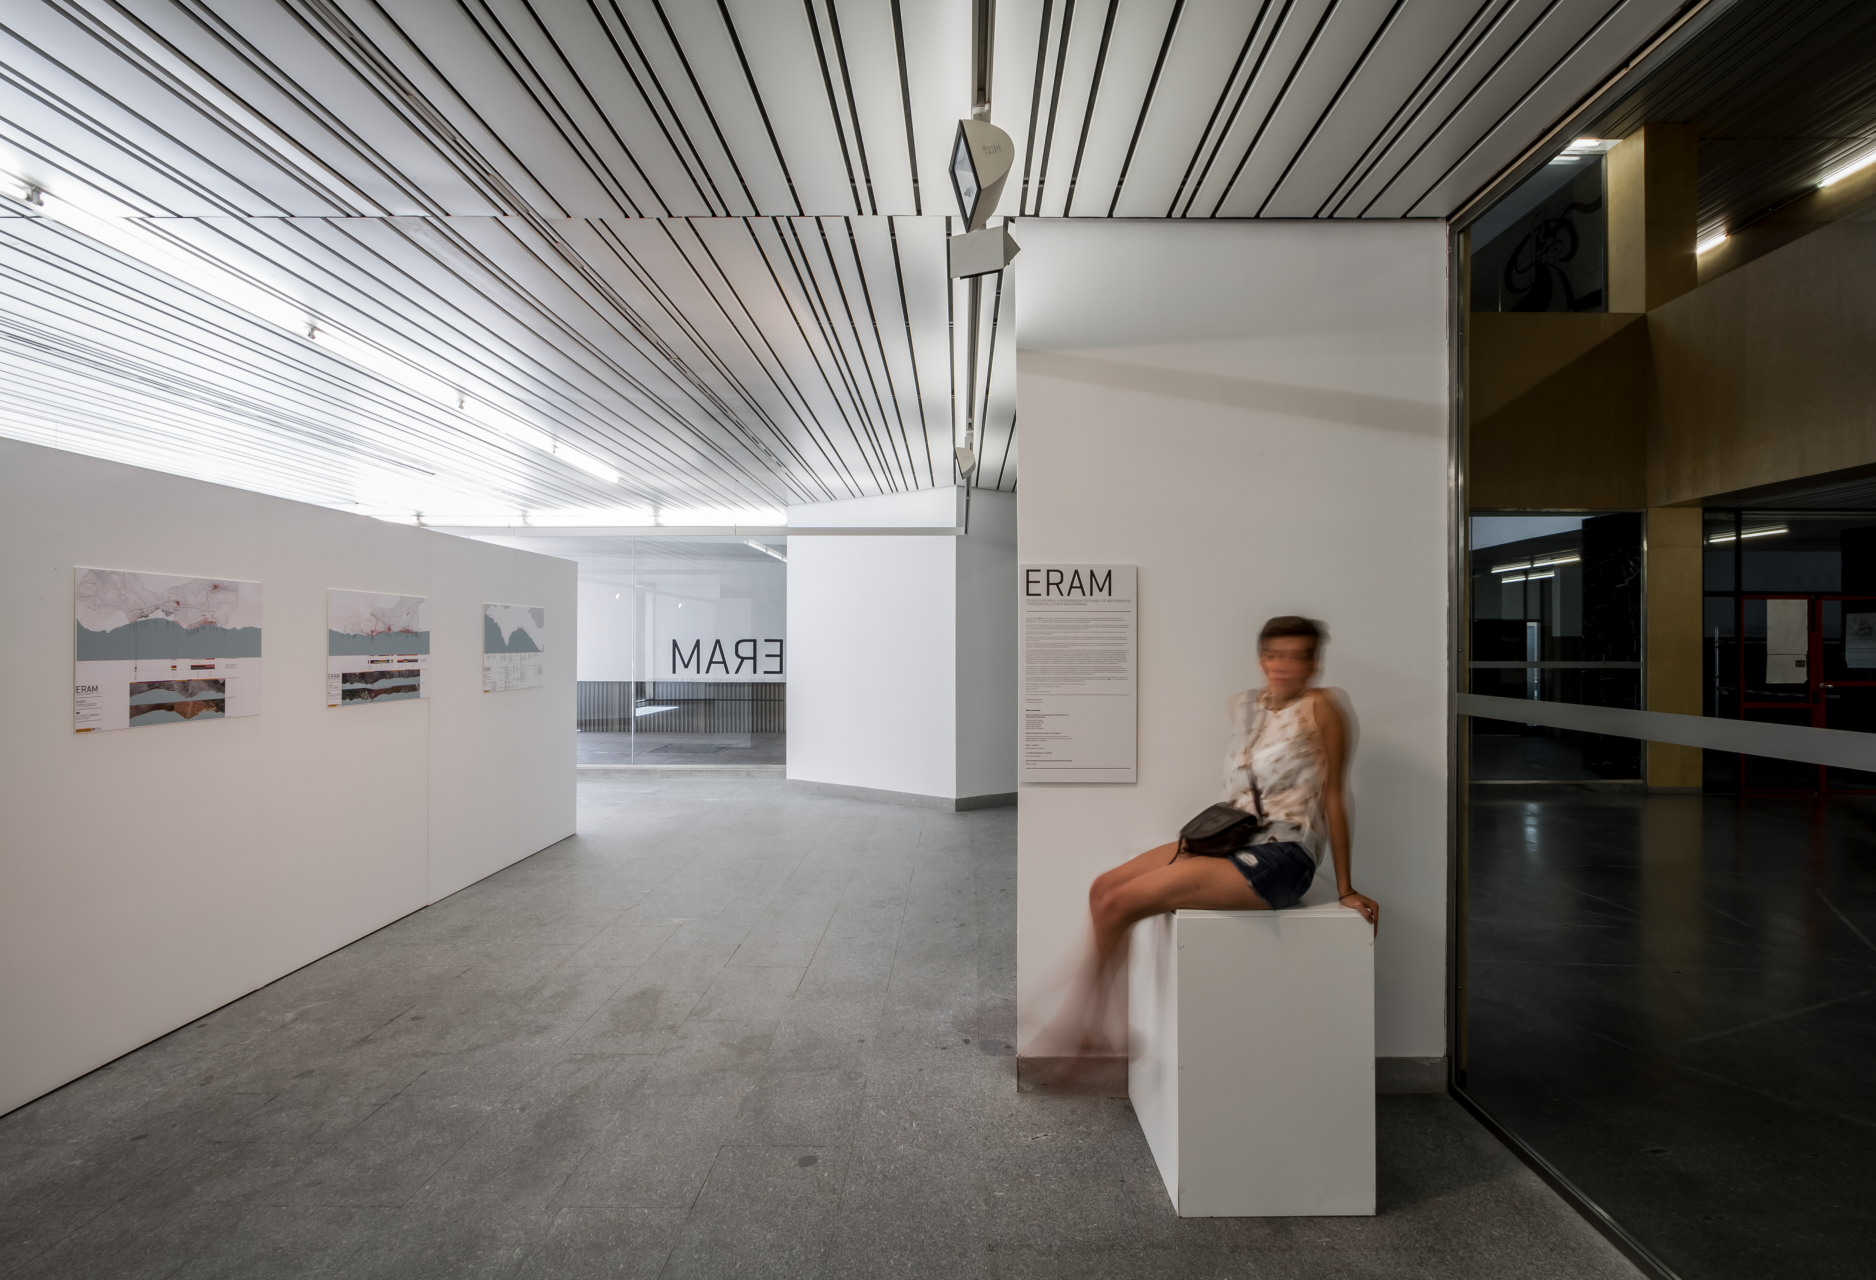 fotografia-arquitectura-valencia-german-cabo-upv-etsav-eram-exposicion (13)